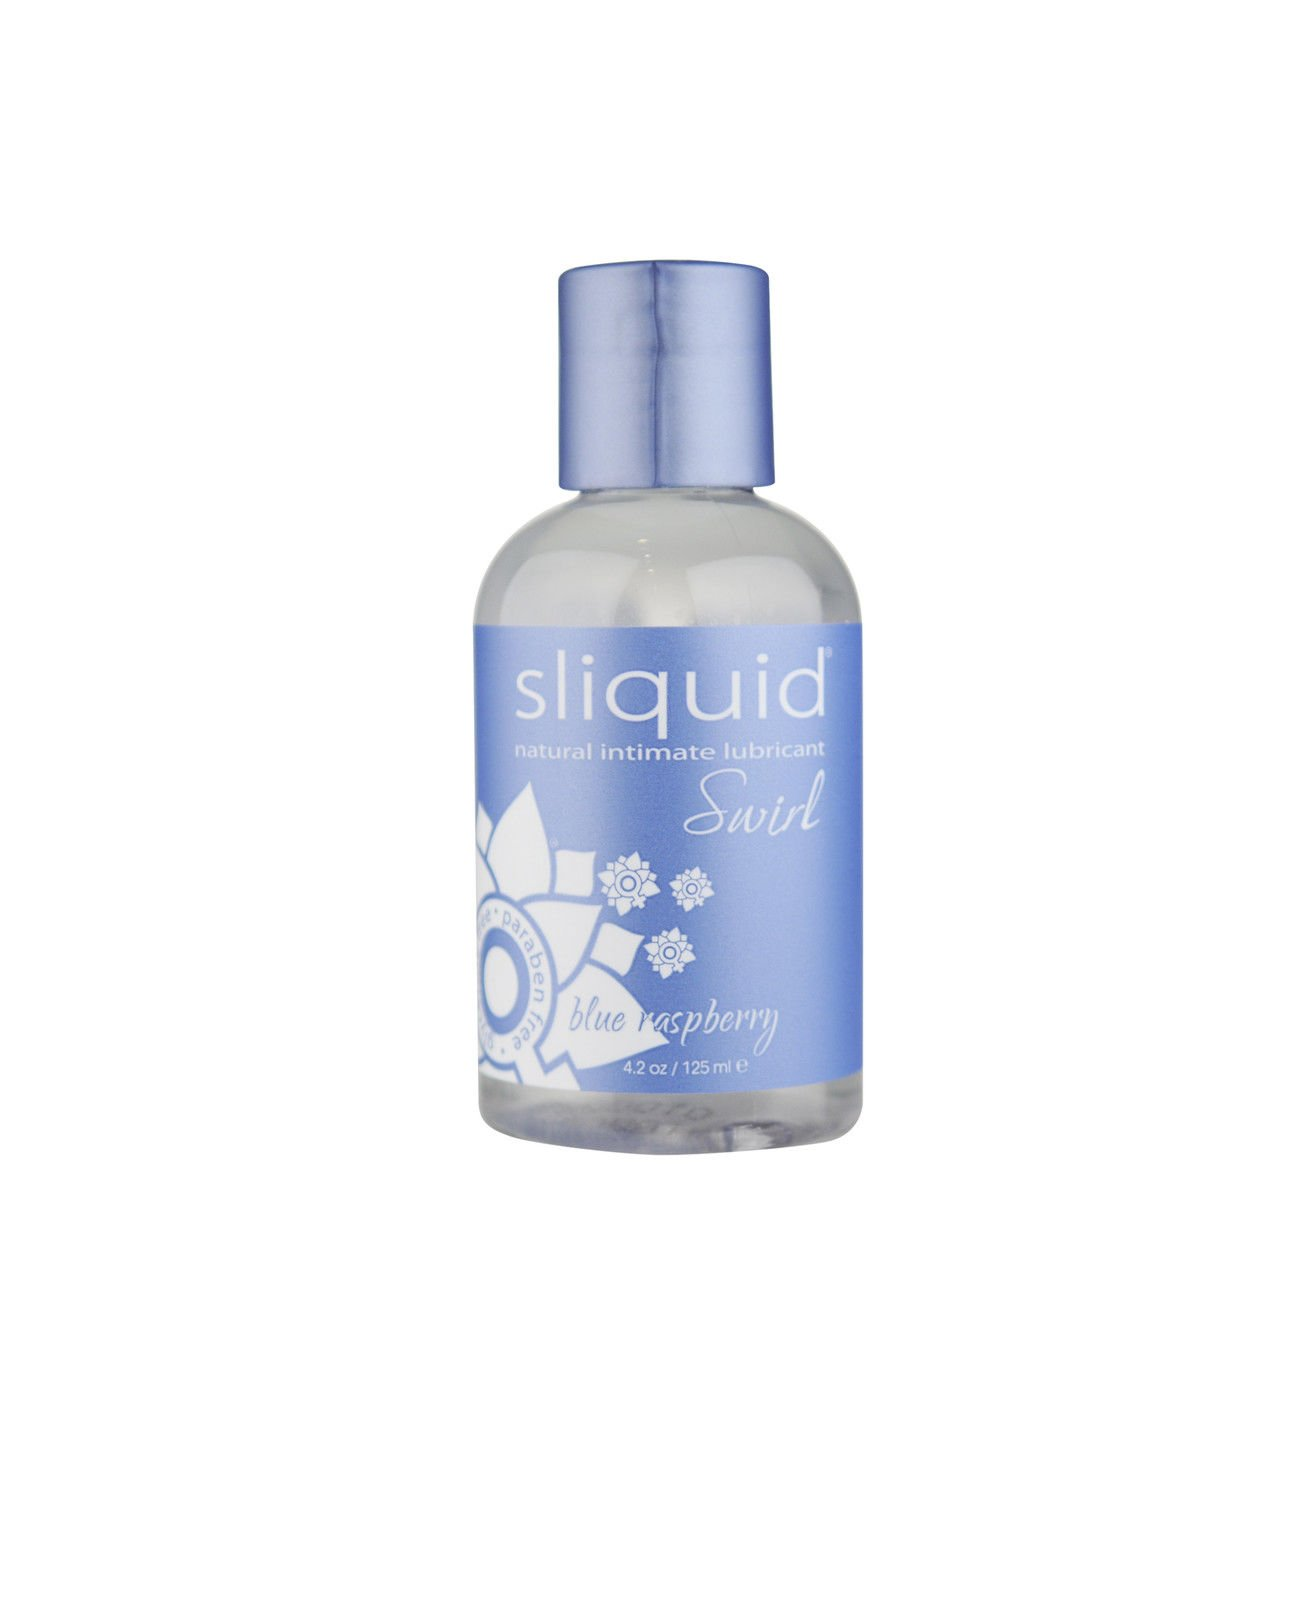 Sliquid Swirl Lubricant - Blue Raspberry Flavor - 4.2 Oz